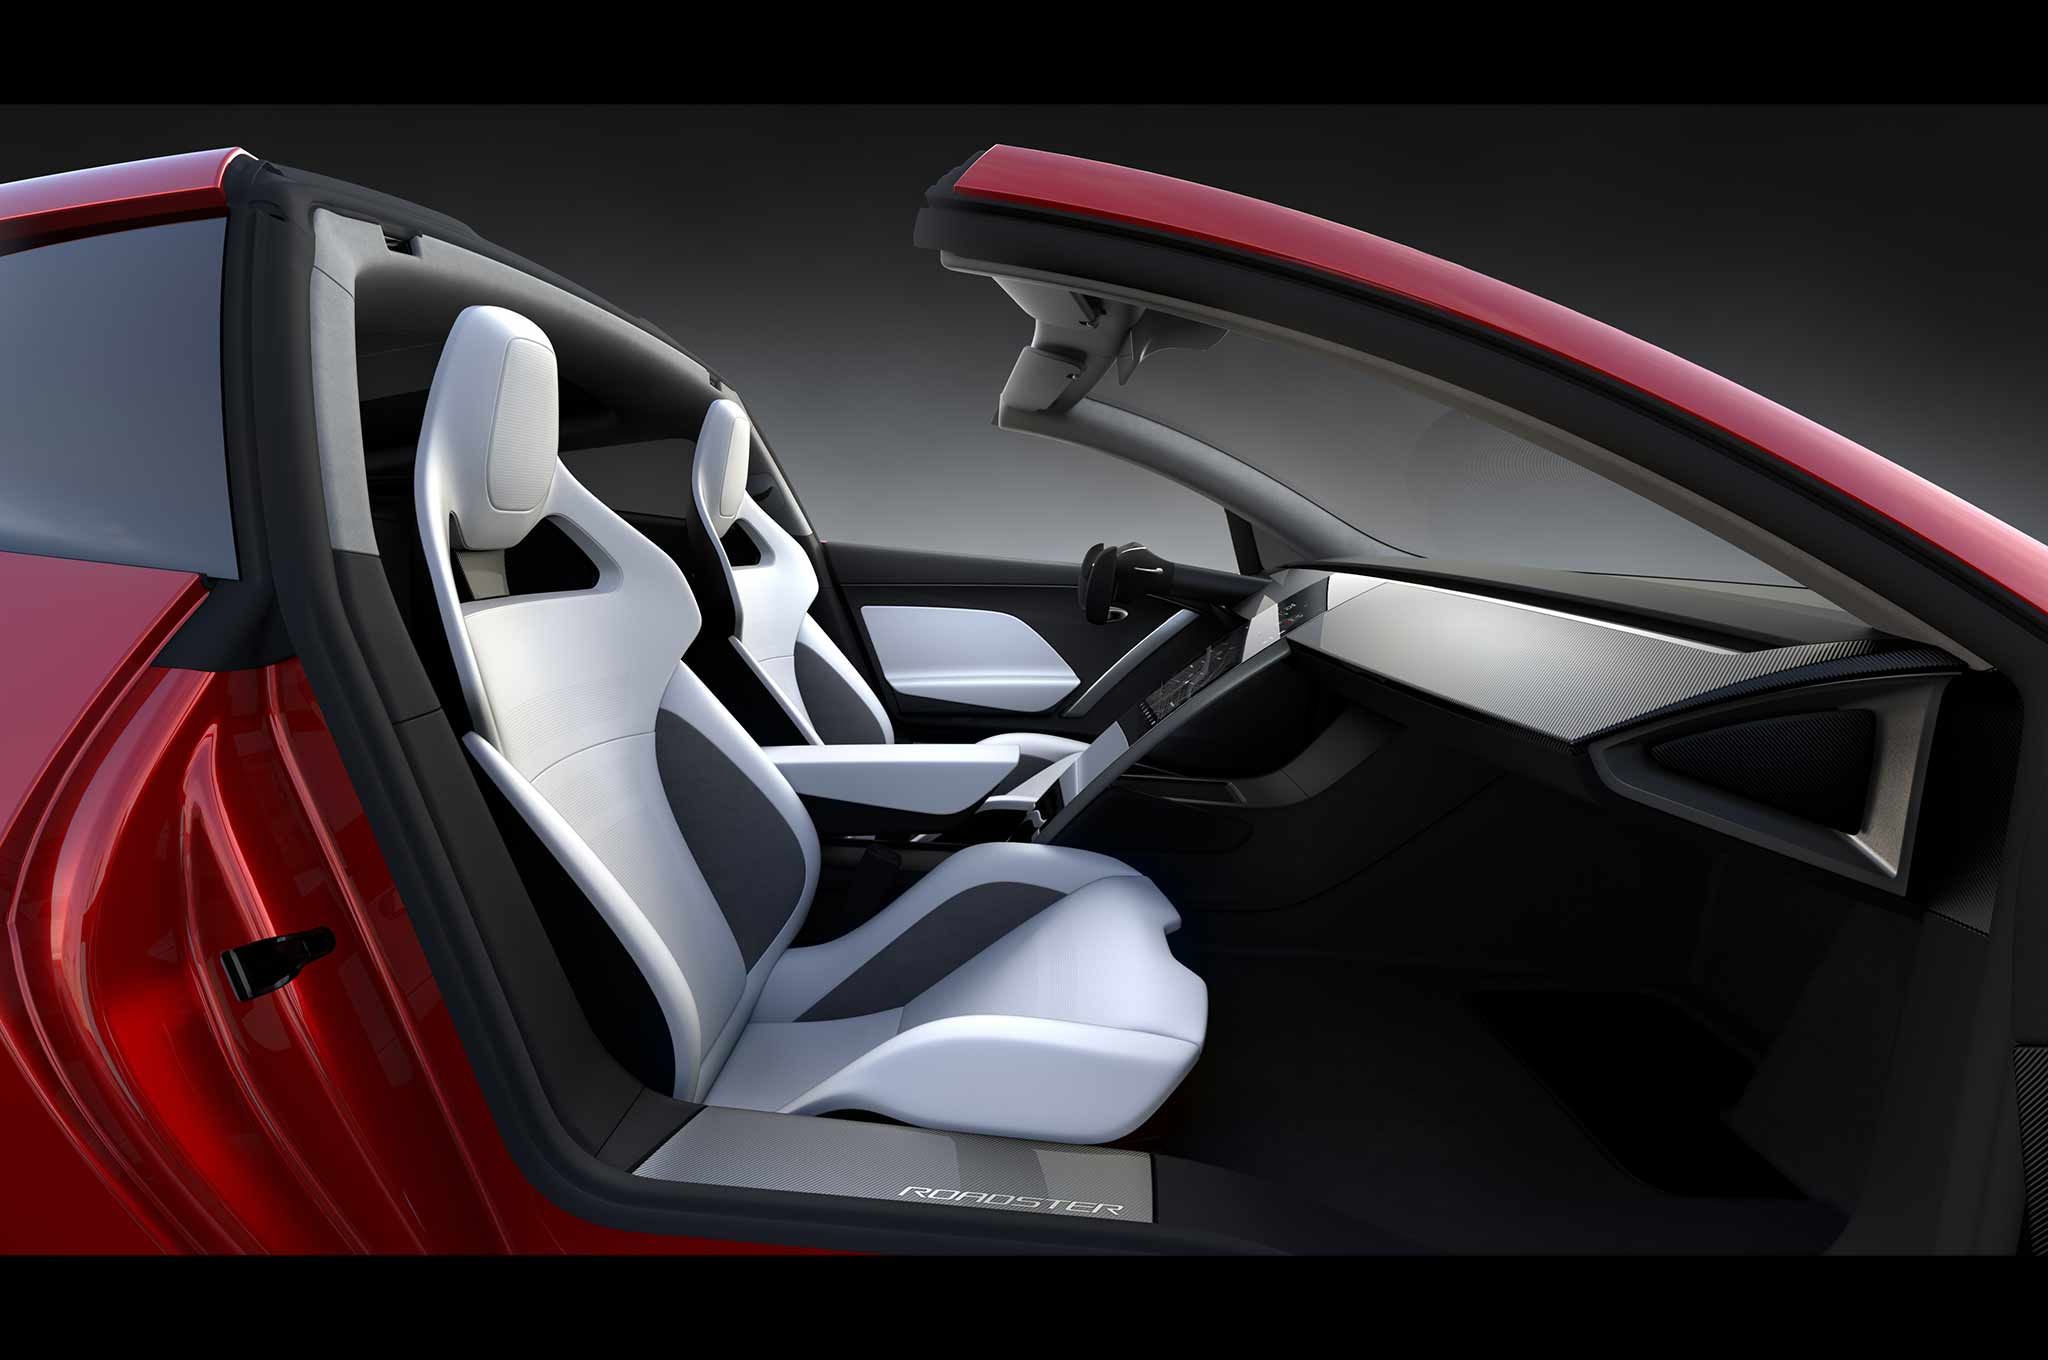 2019 New and Future Cars: 2020 Tesla Roadster | Automobile Magazine